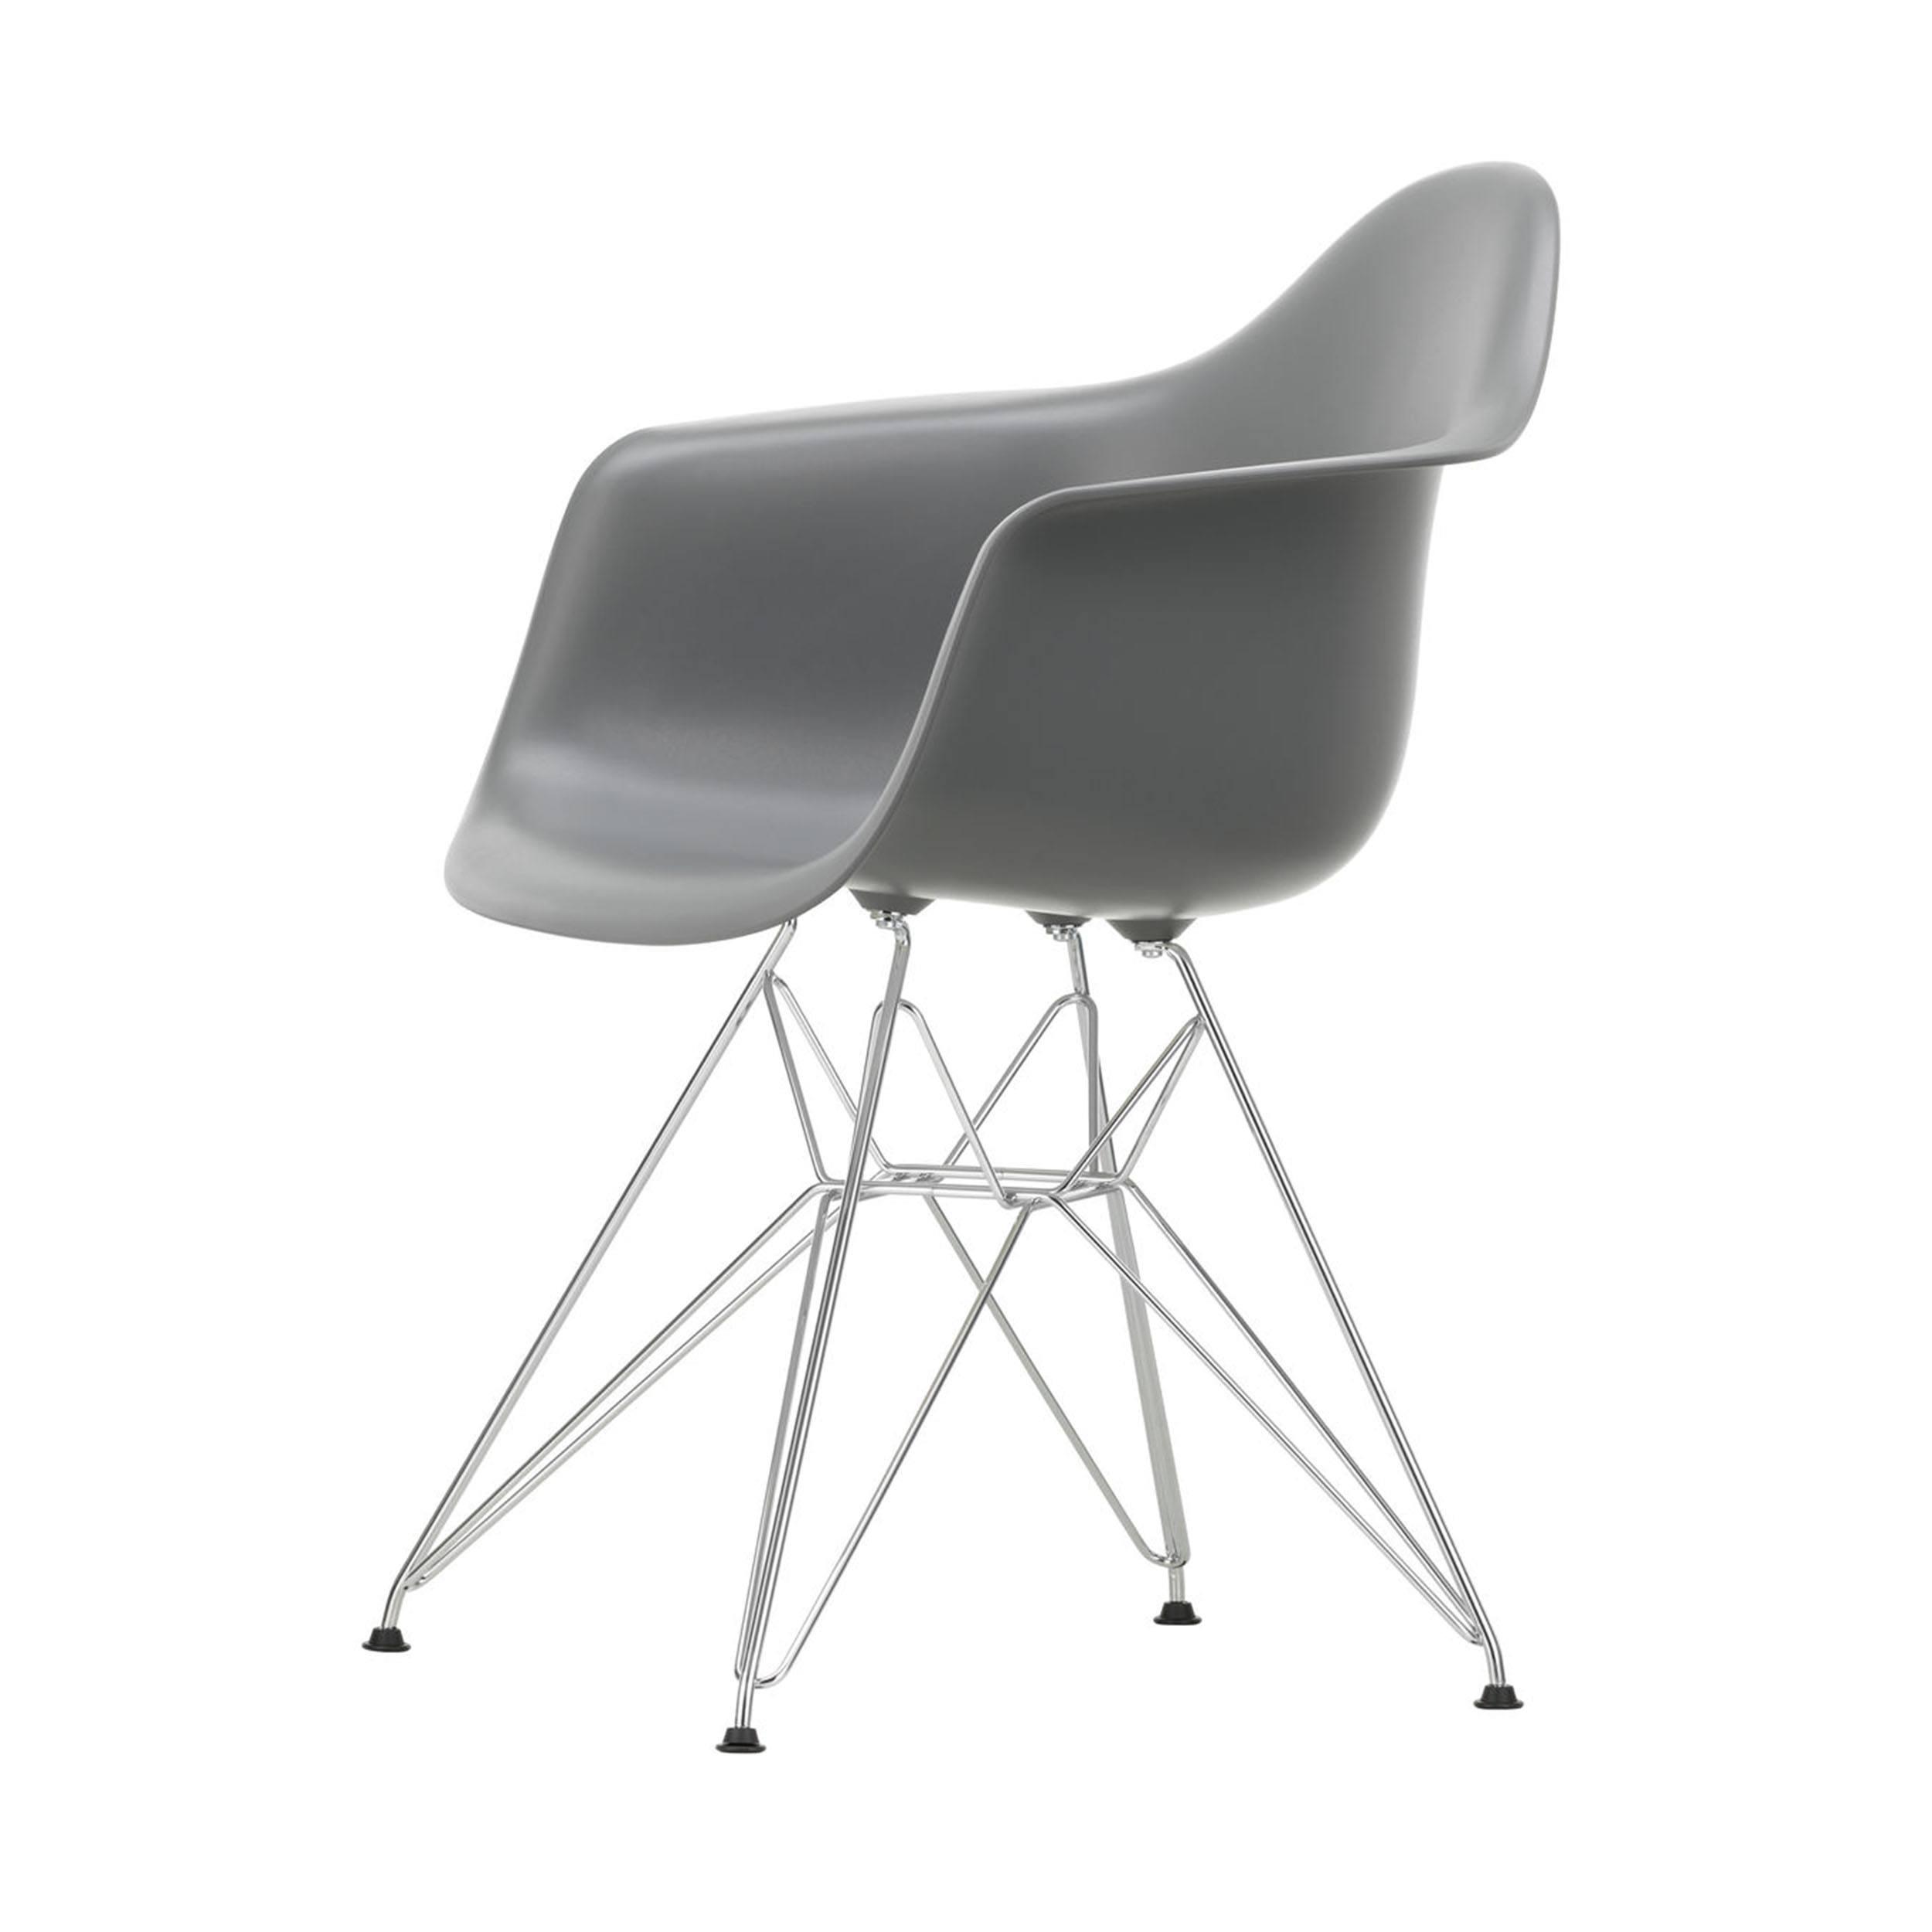 Eames Plastic Armchair Stuhl DAR mit Filzgleitern